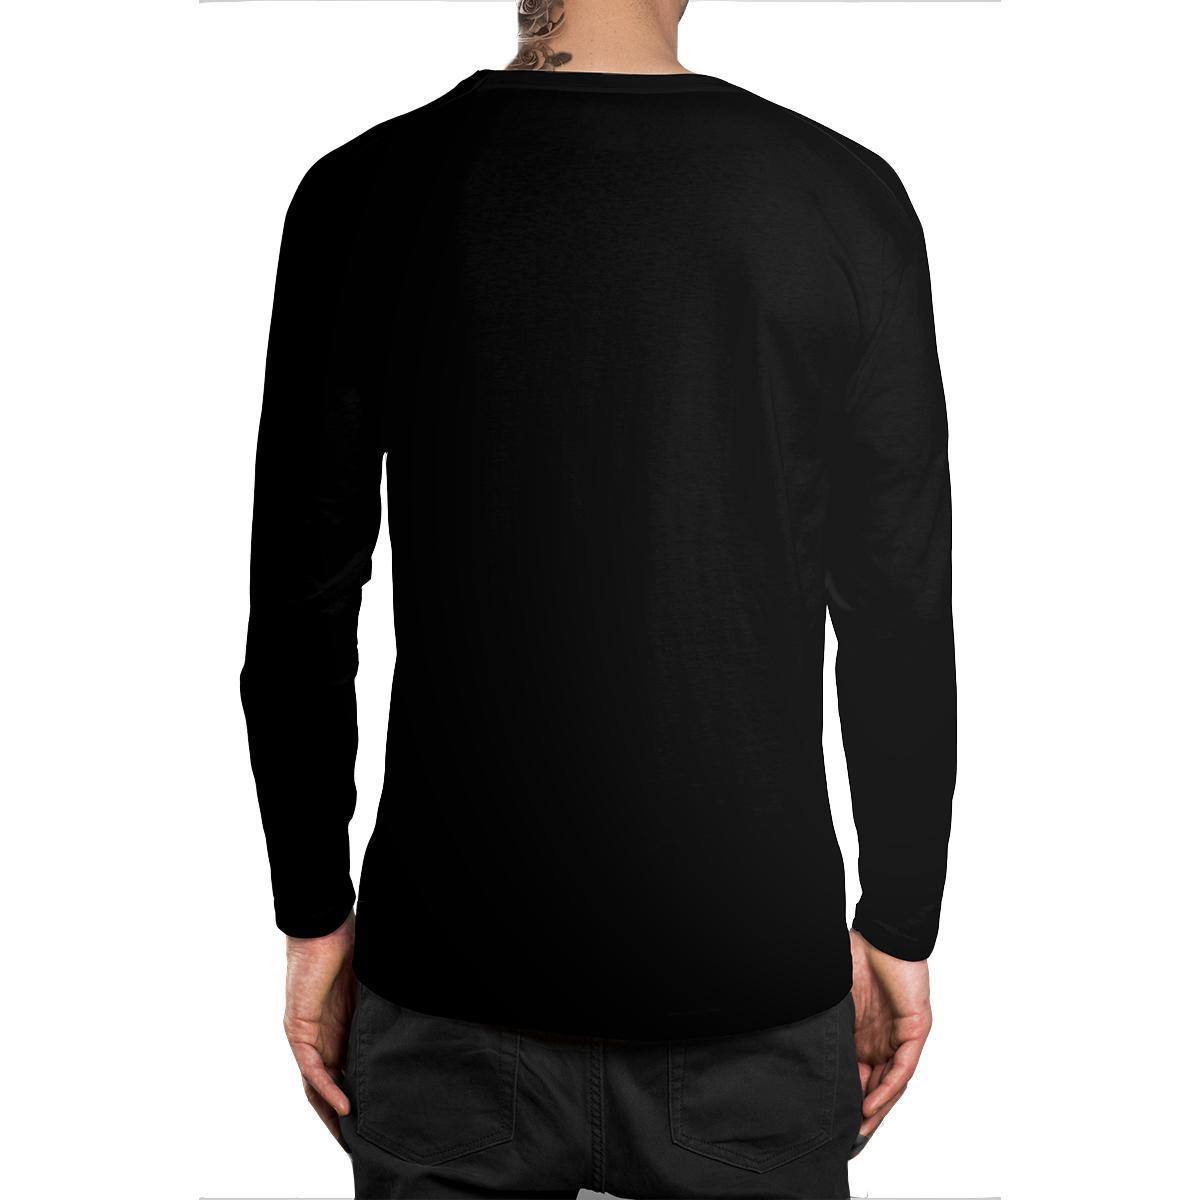 Stompy Camiseta Manga Longa Modelo 50